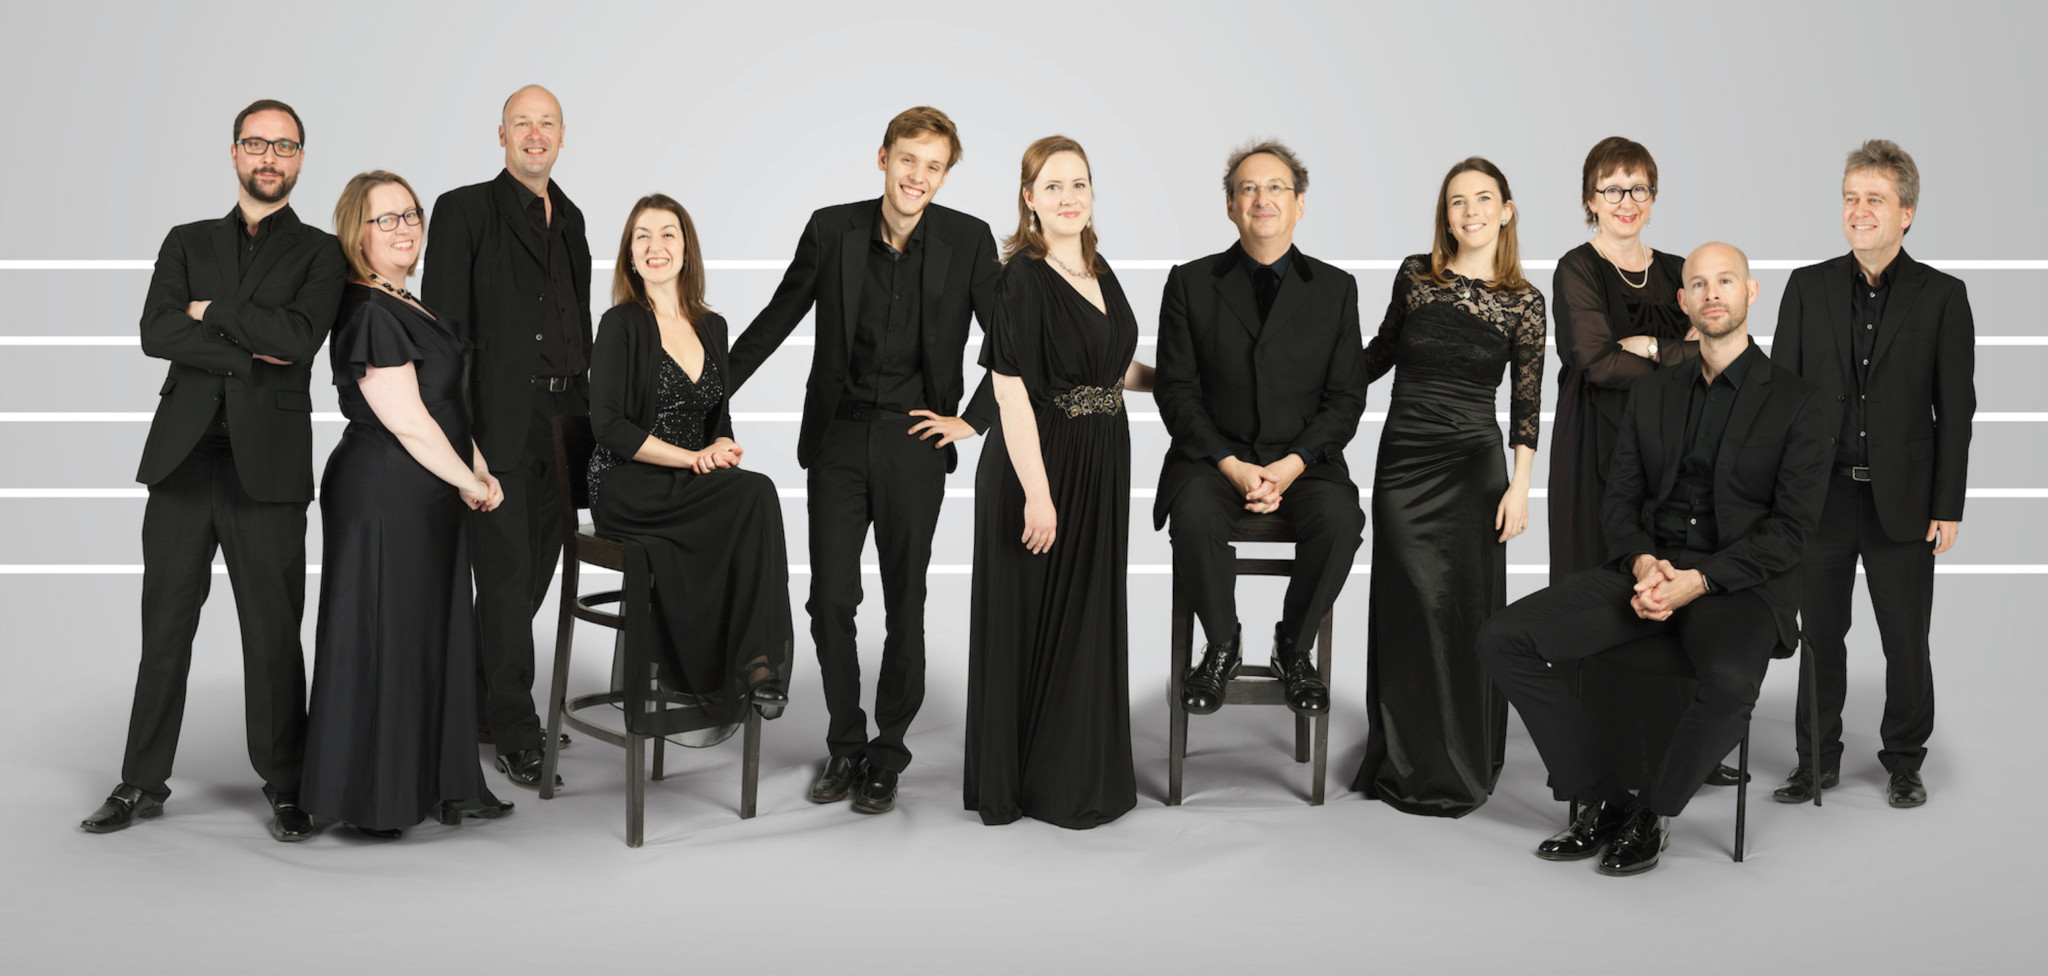 EMV Presents World's Premiere Vocal Ensemble Specializing in Renaissance Polyphony – War & Peace: The Tallis Scholars –